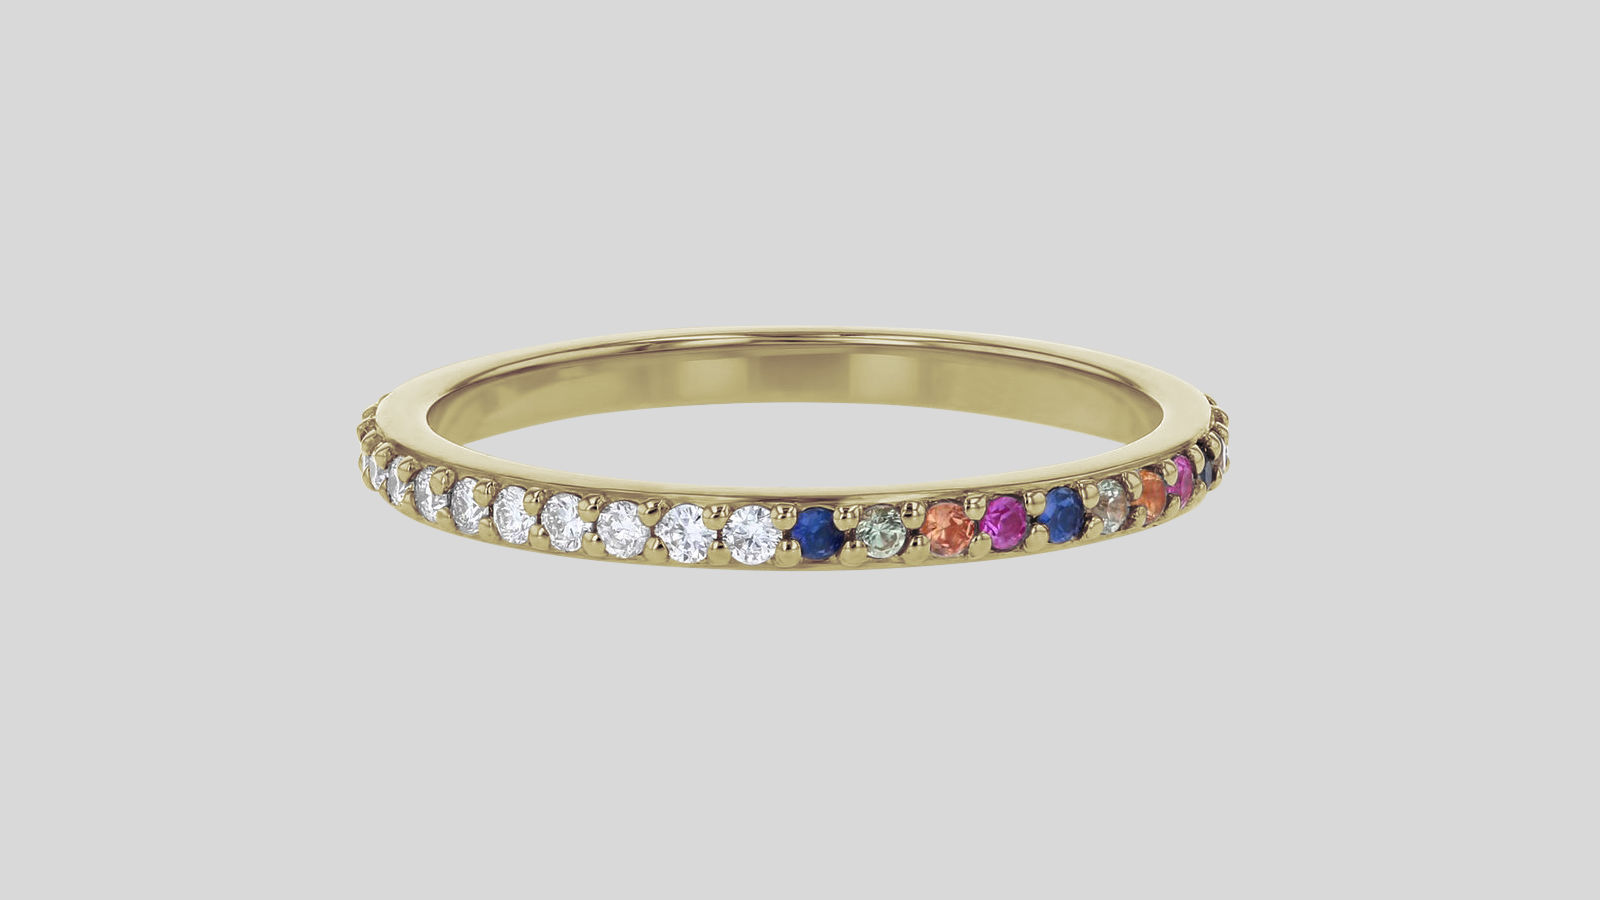 The Half White Diamond Half Multi-Color Sapphire Eternity Band Ring